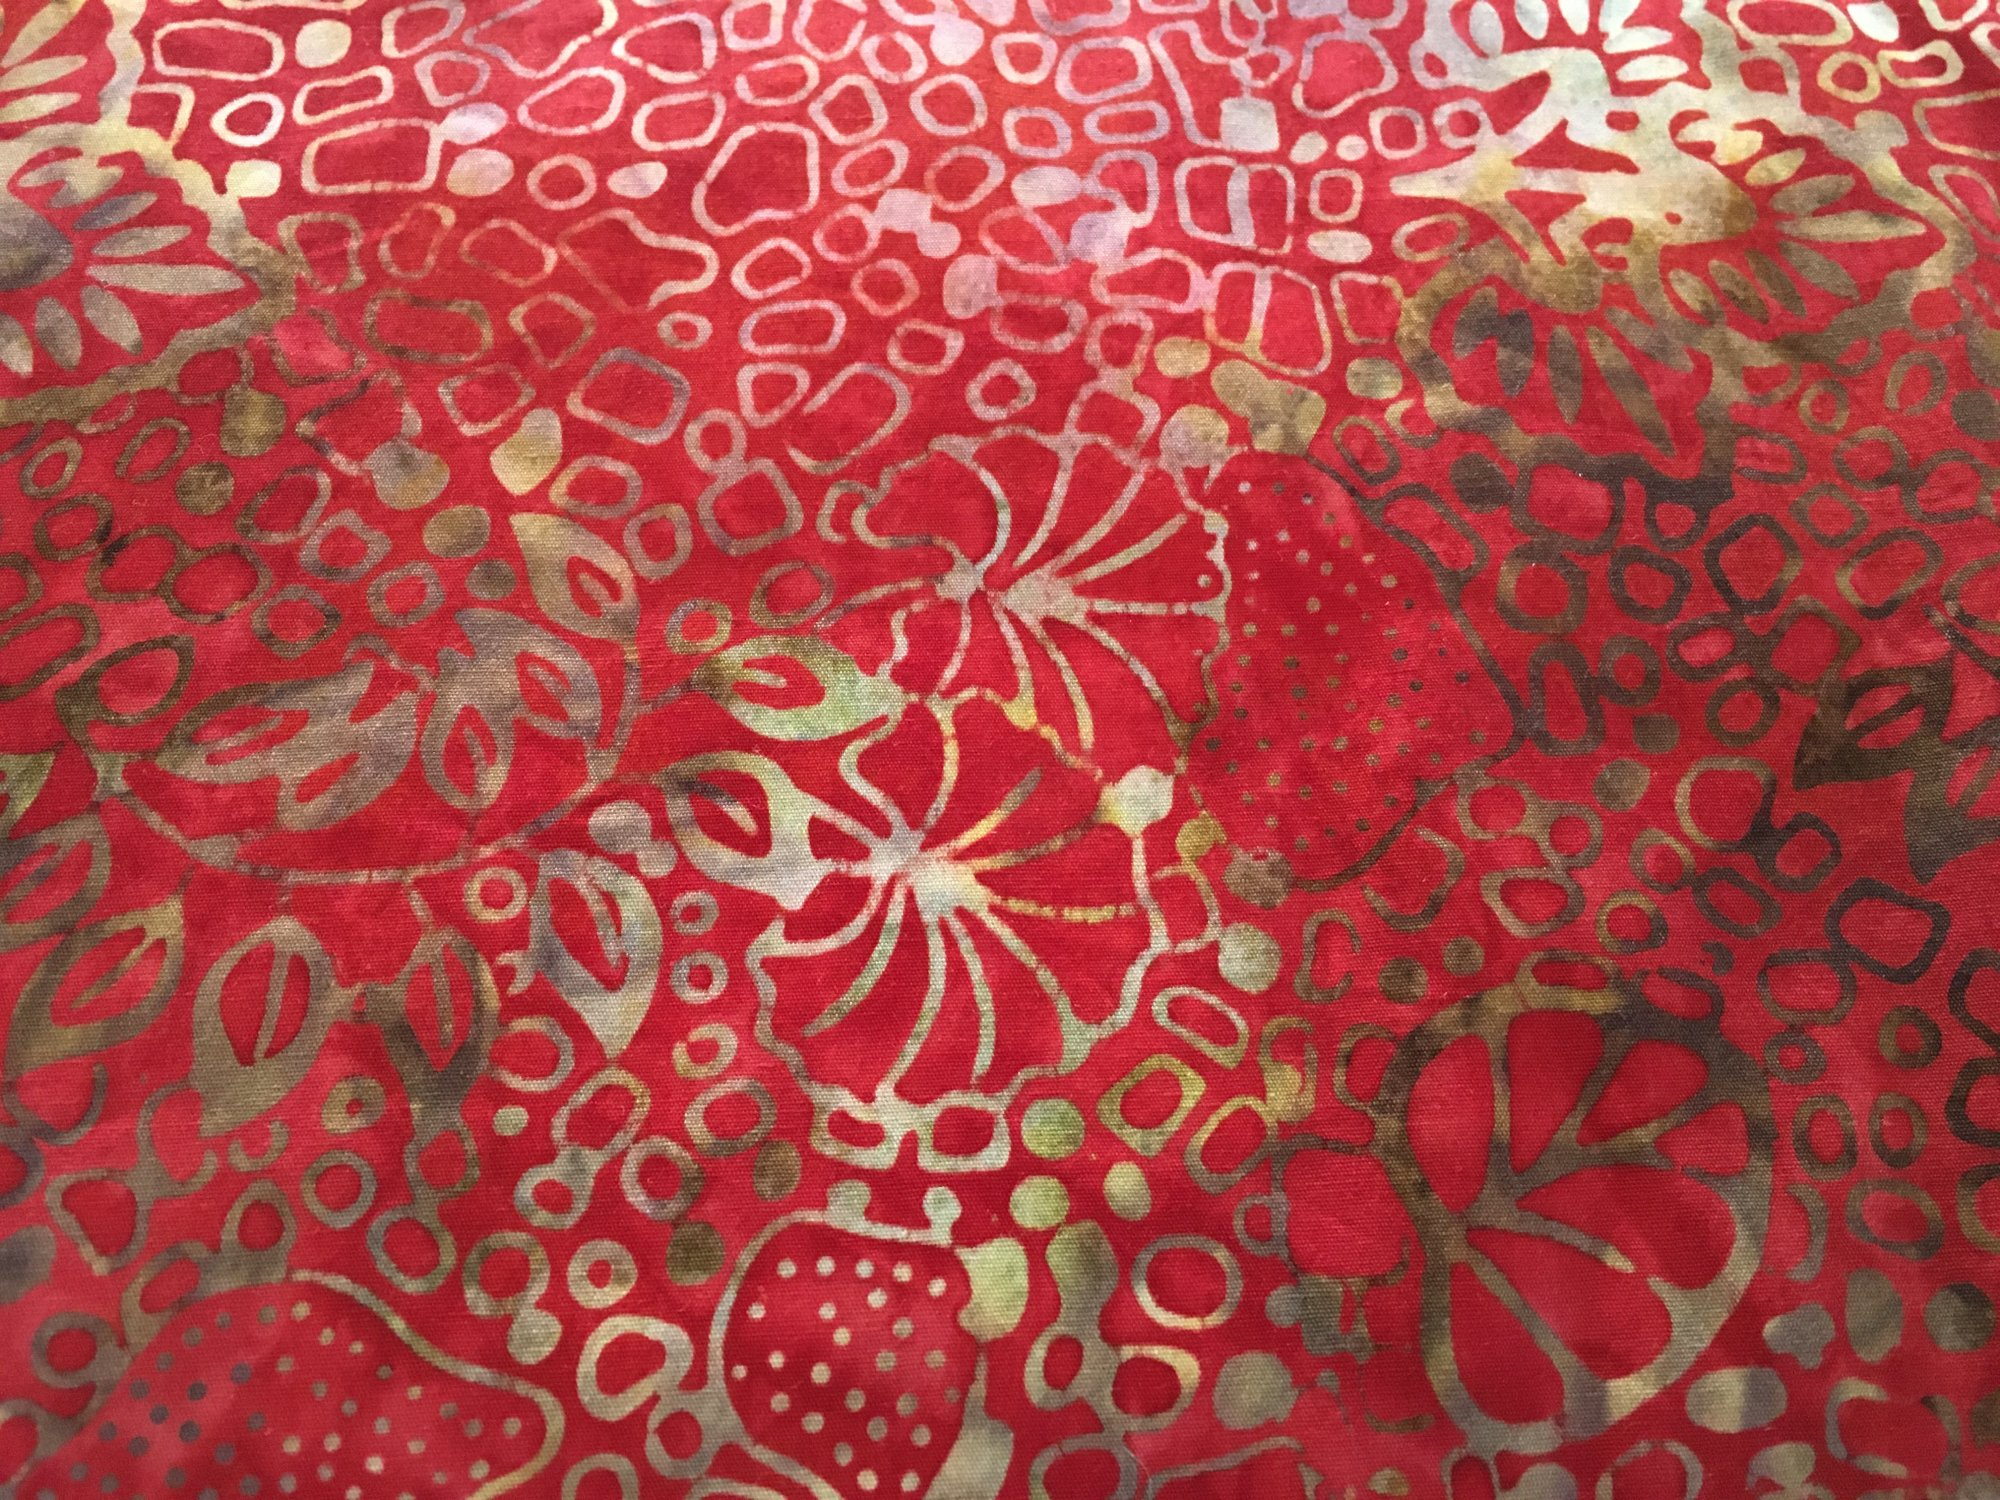 BATIK CALYPSO BALIS RED CREAM 0703010 Benartex Batiks